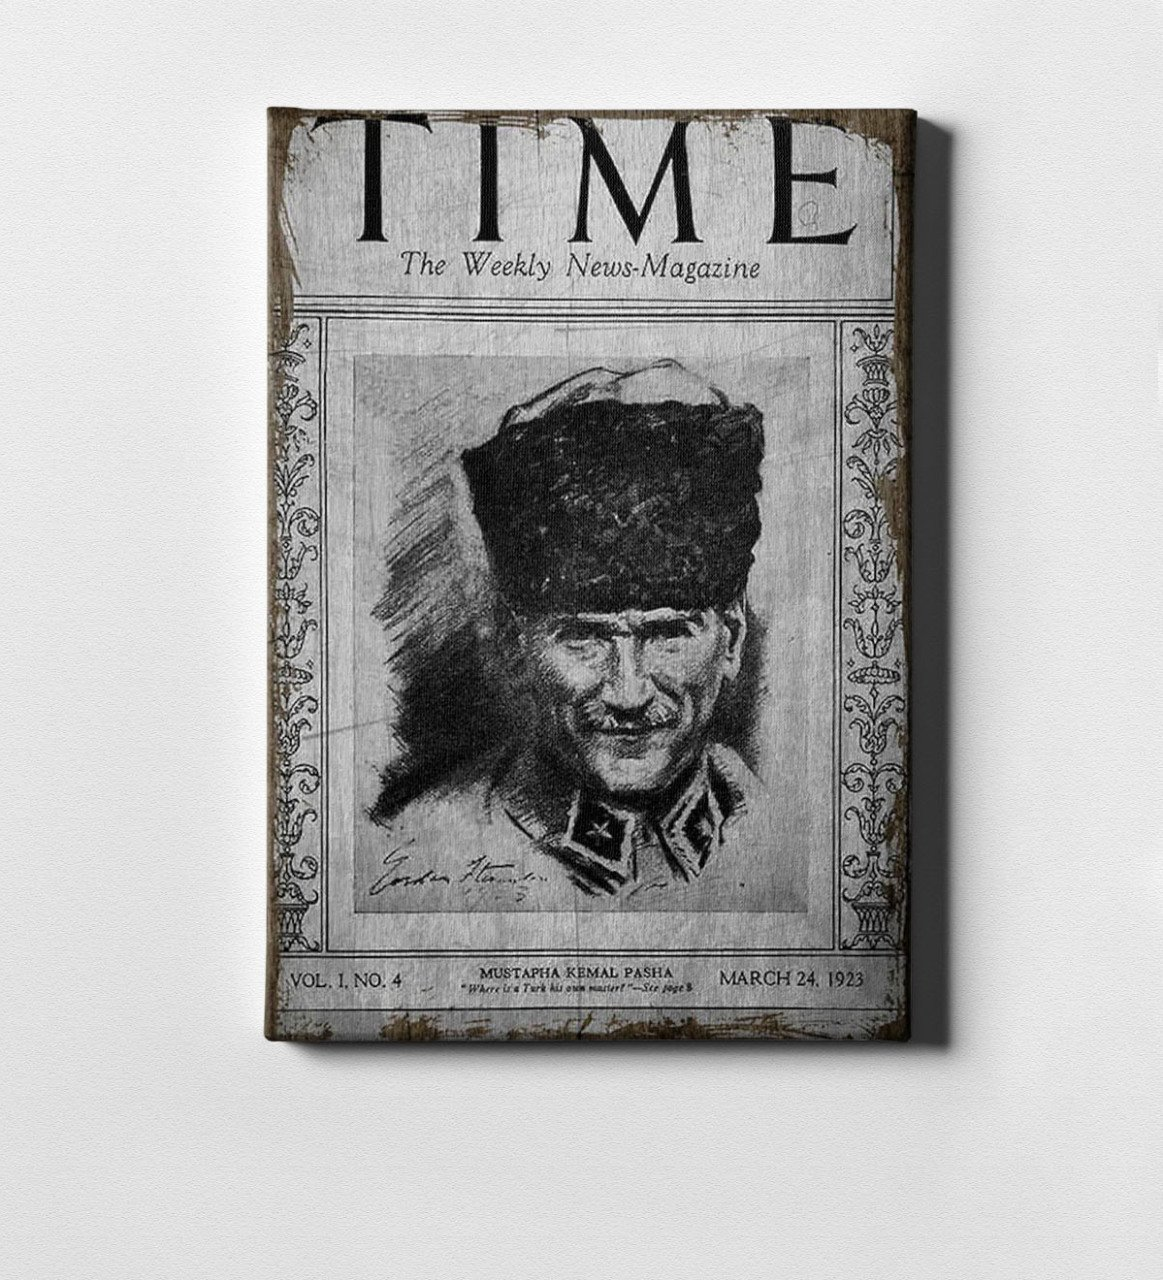 Personalized Ataturk Time Magazine Cover Canvas Print (50x70 Cm.)